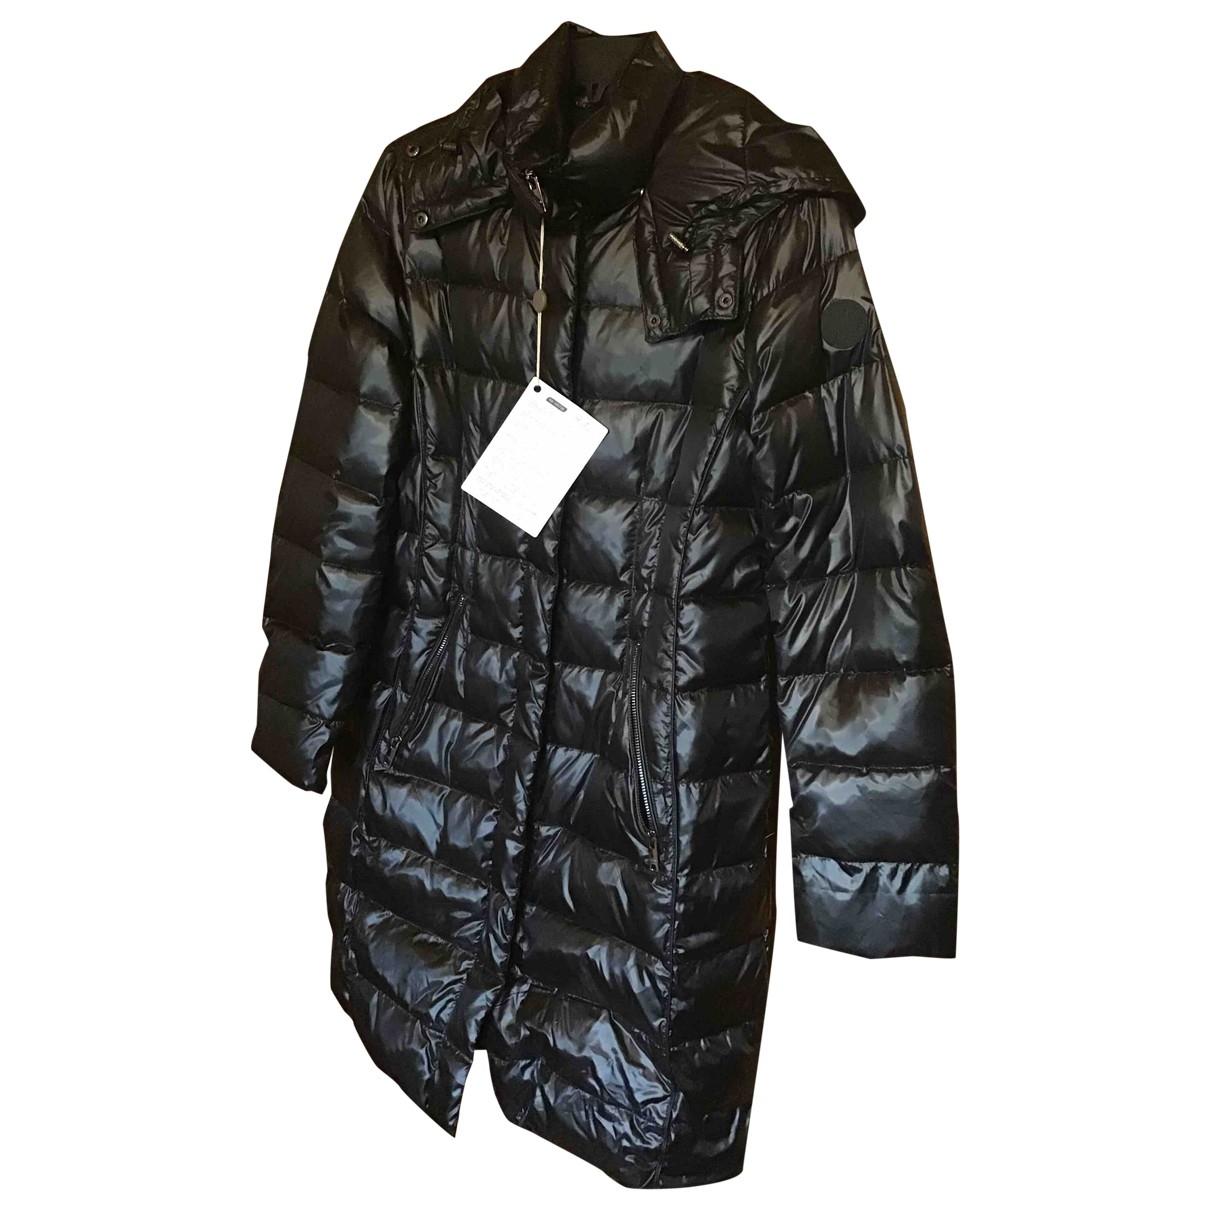 Dkny \N Black jacket for Women M International